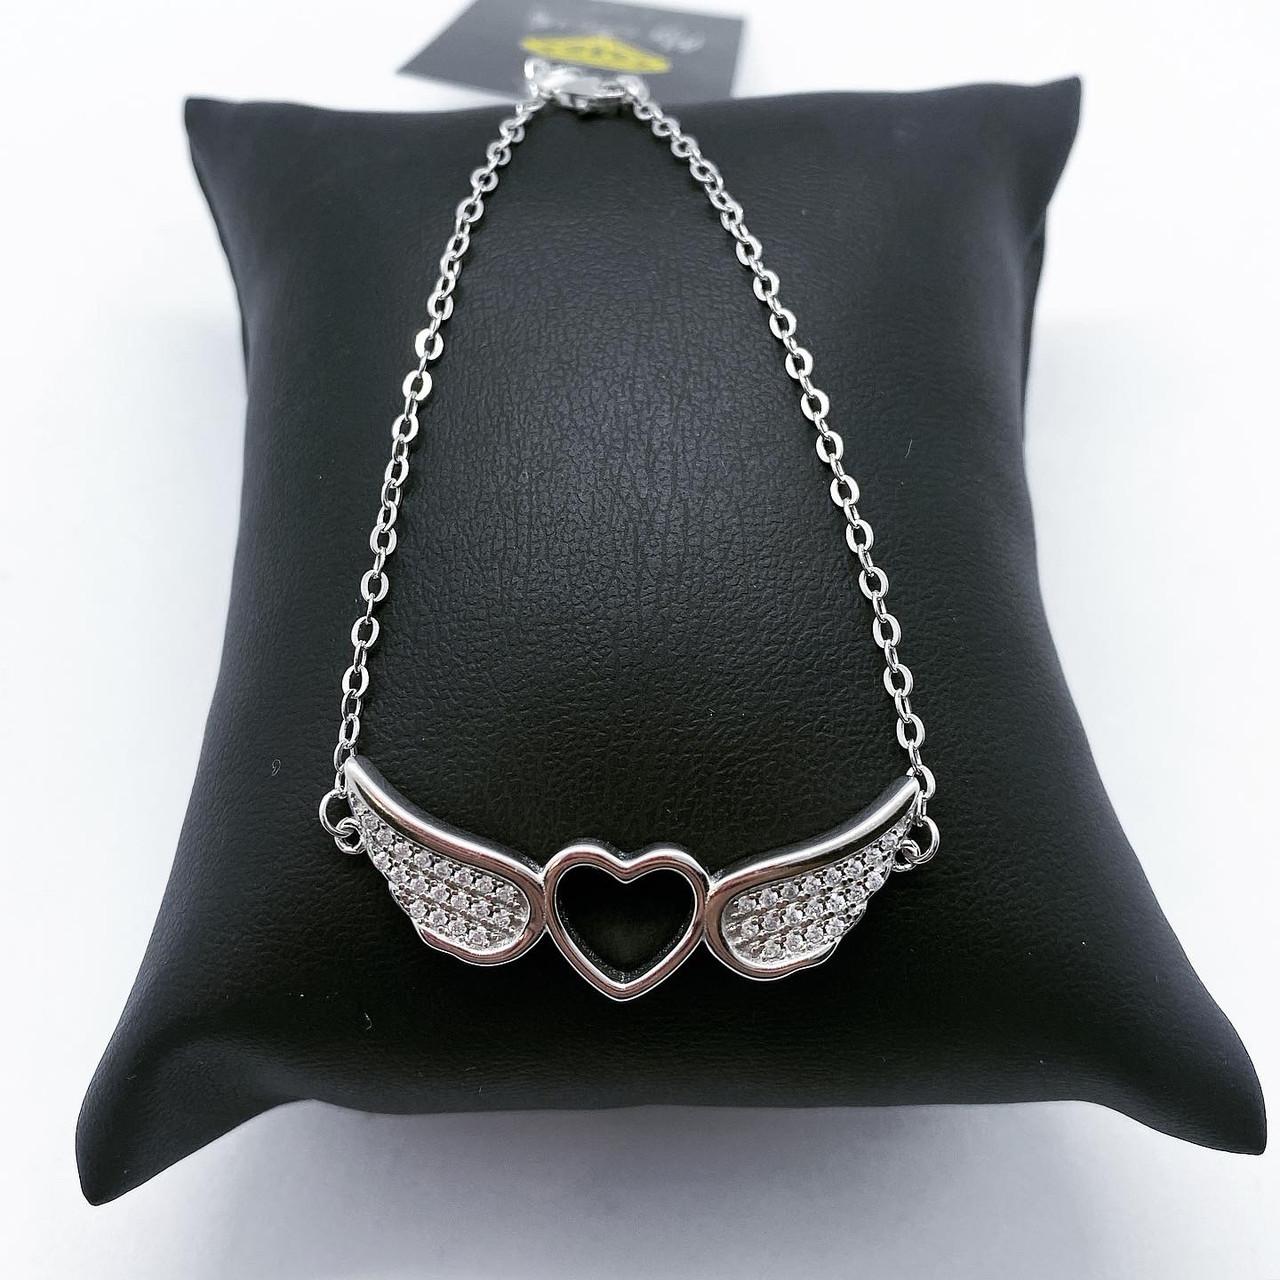 Браслет My Jewels из серебра 925 с сердечком